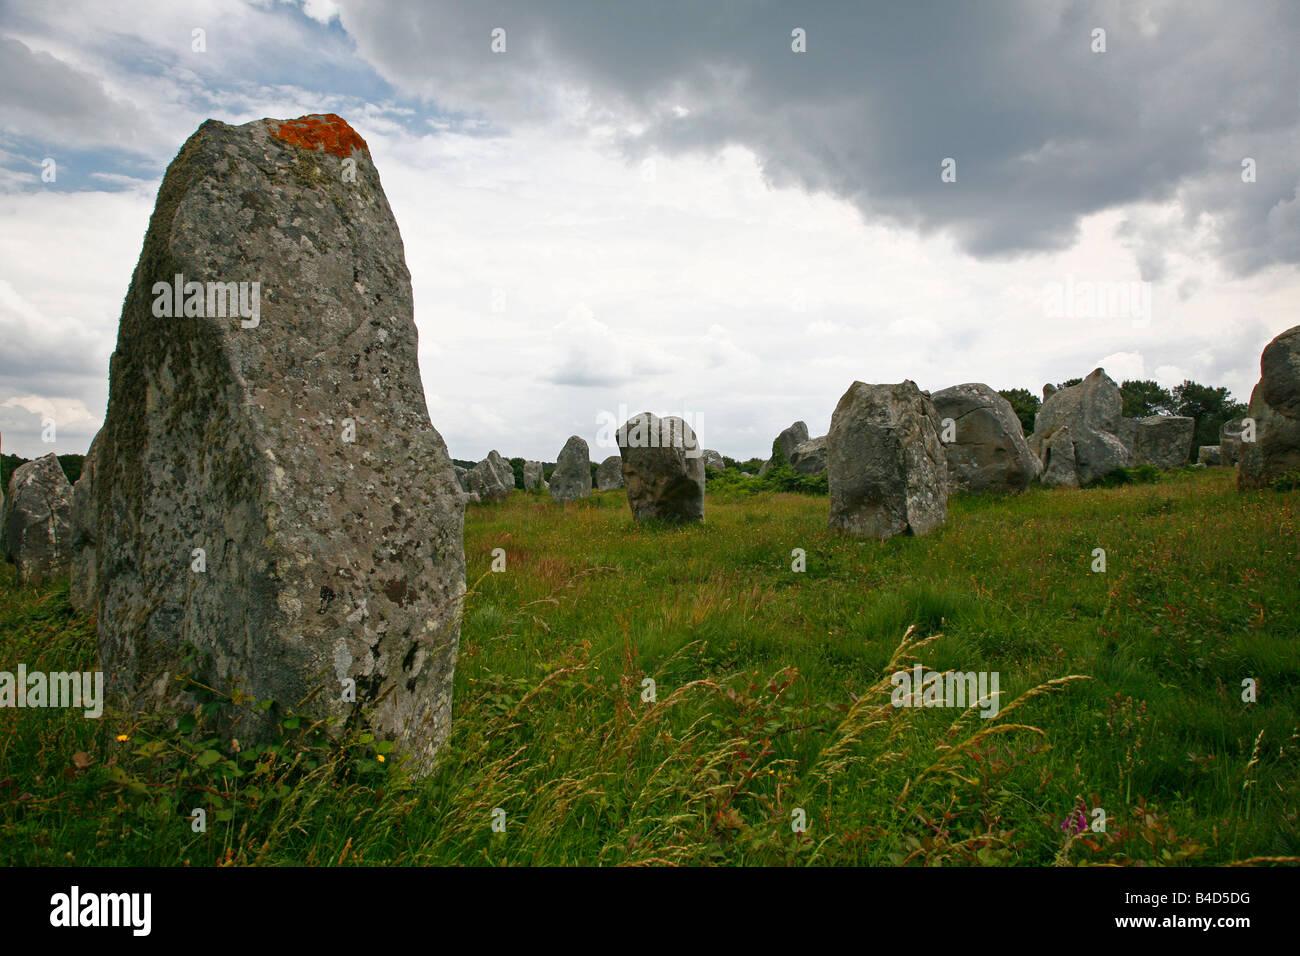 July 2008 - Megalithic stones alignments de Kremario Carnac Morbihan Brittany France Stock Photo